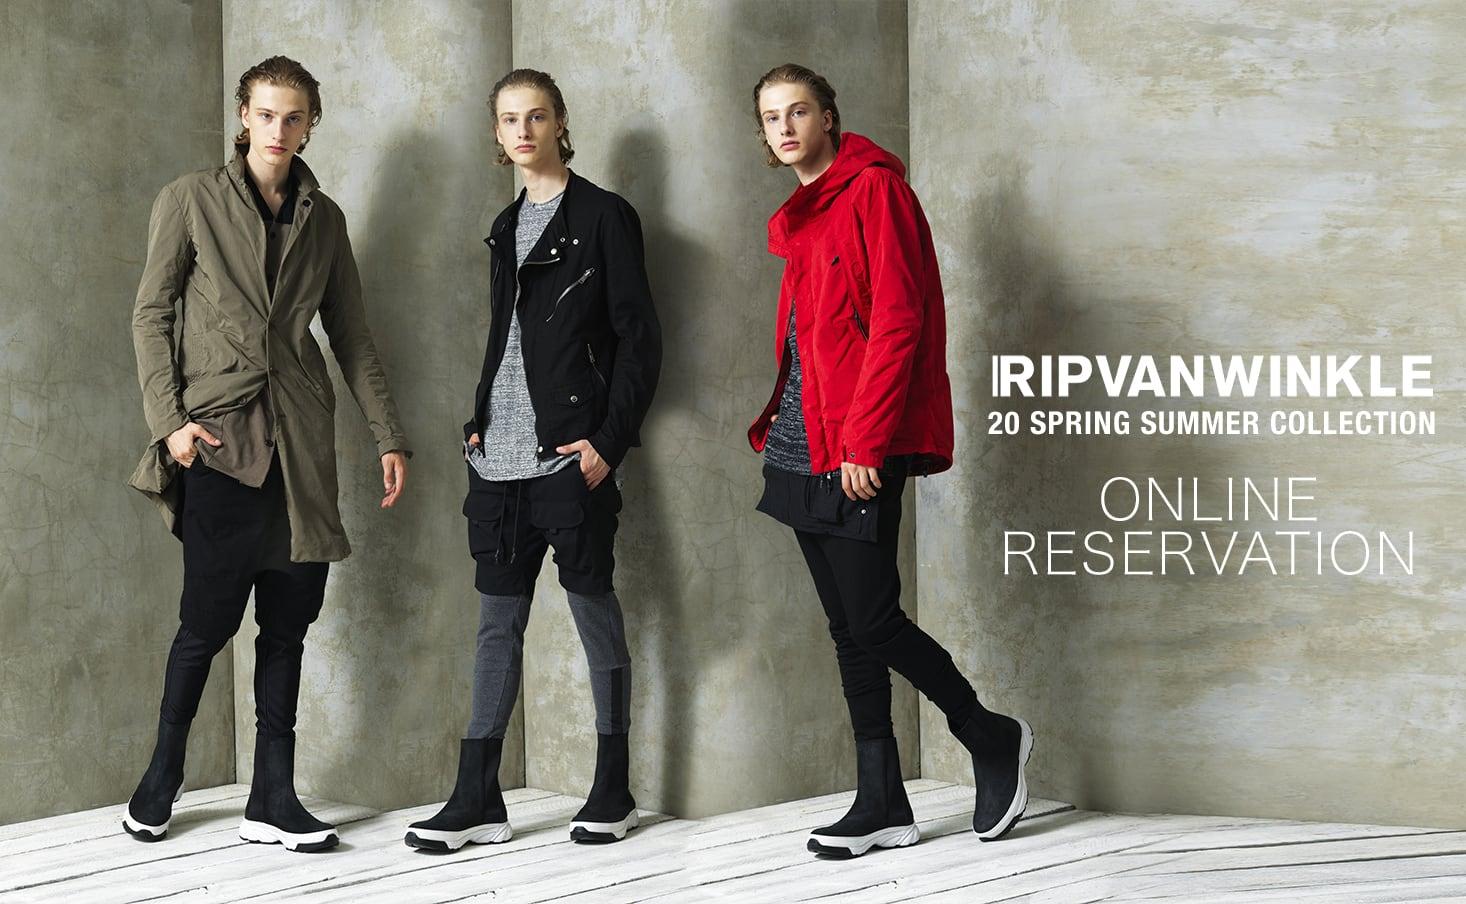 RIPVANWINKLE(リップヴァンウィンクル) 2019-20AW(秋冬)コレクションの予約受付